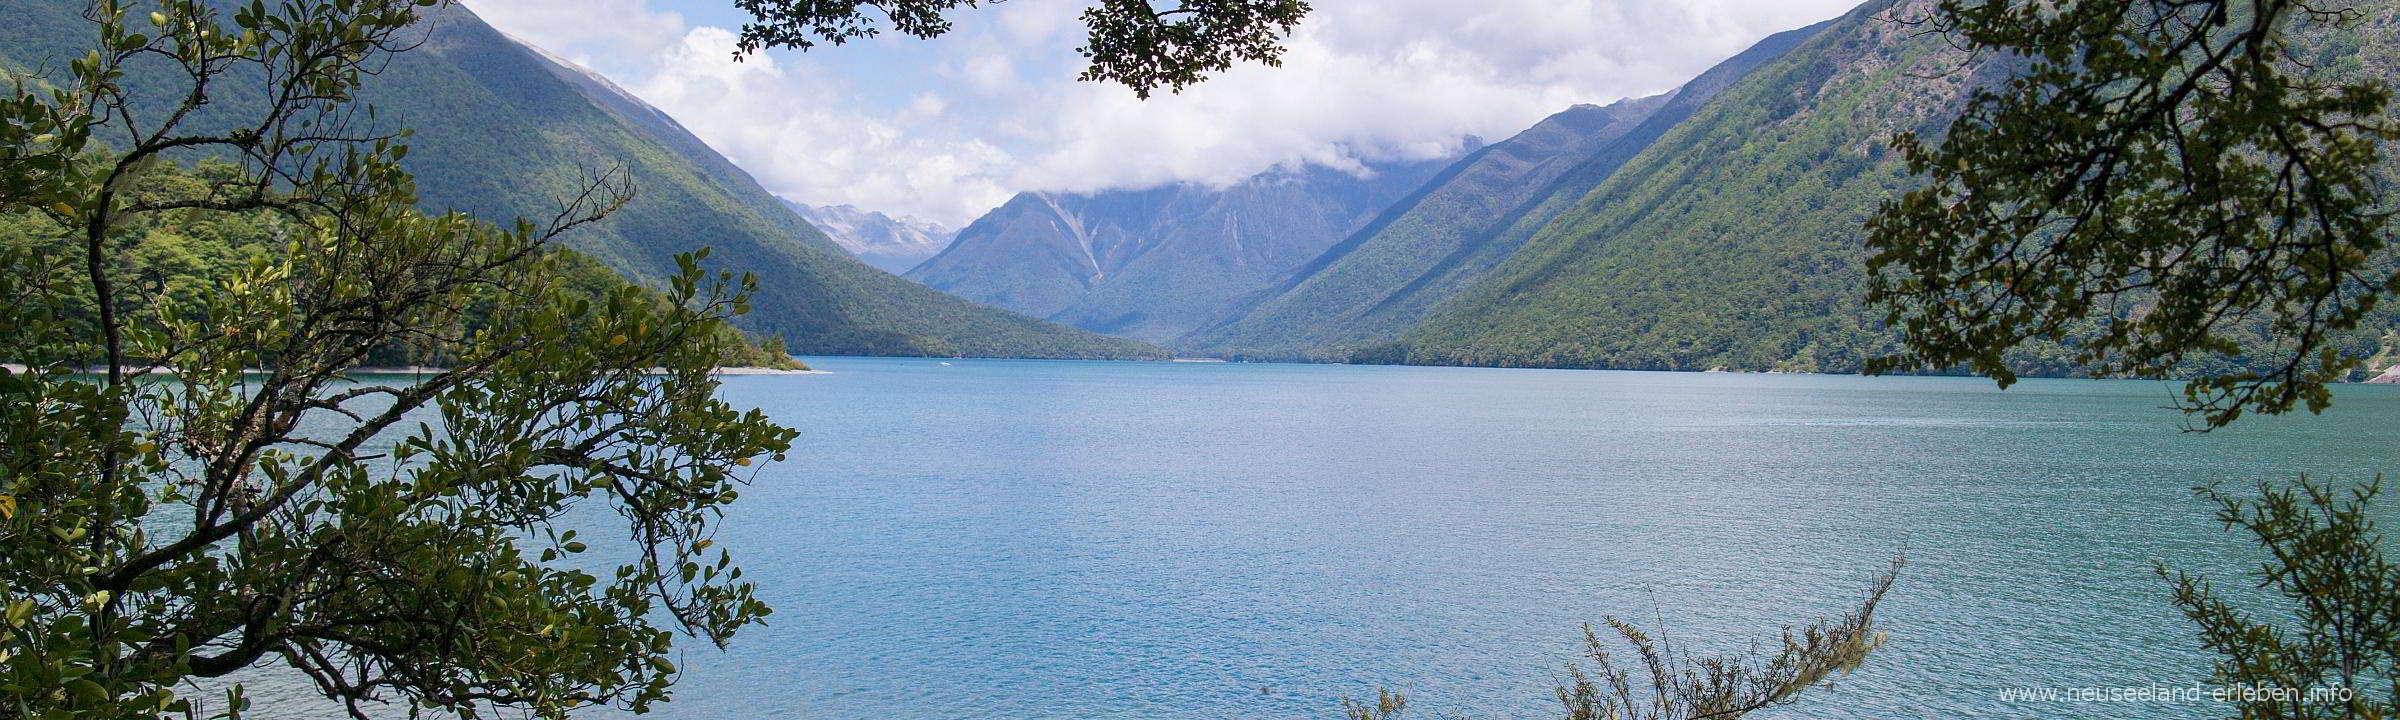 Nelson Lakes Nationalpark – Natur abseits der Touristenpfade